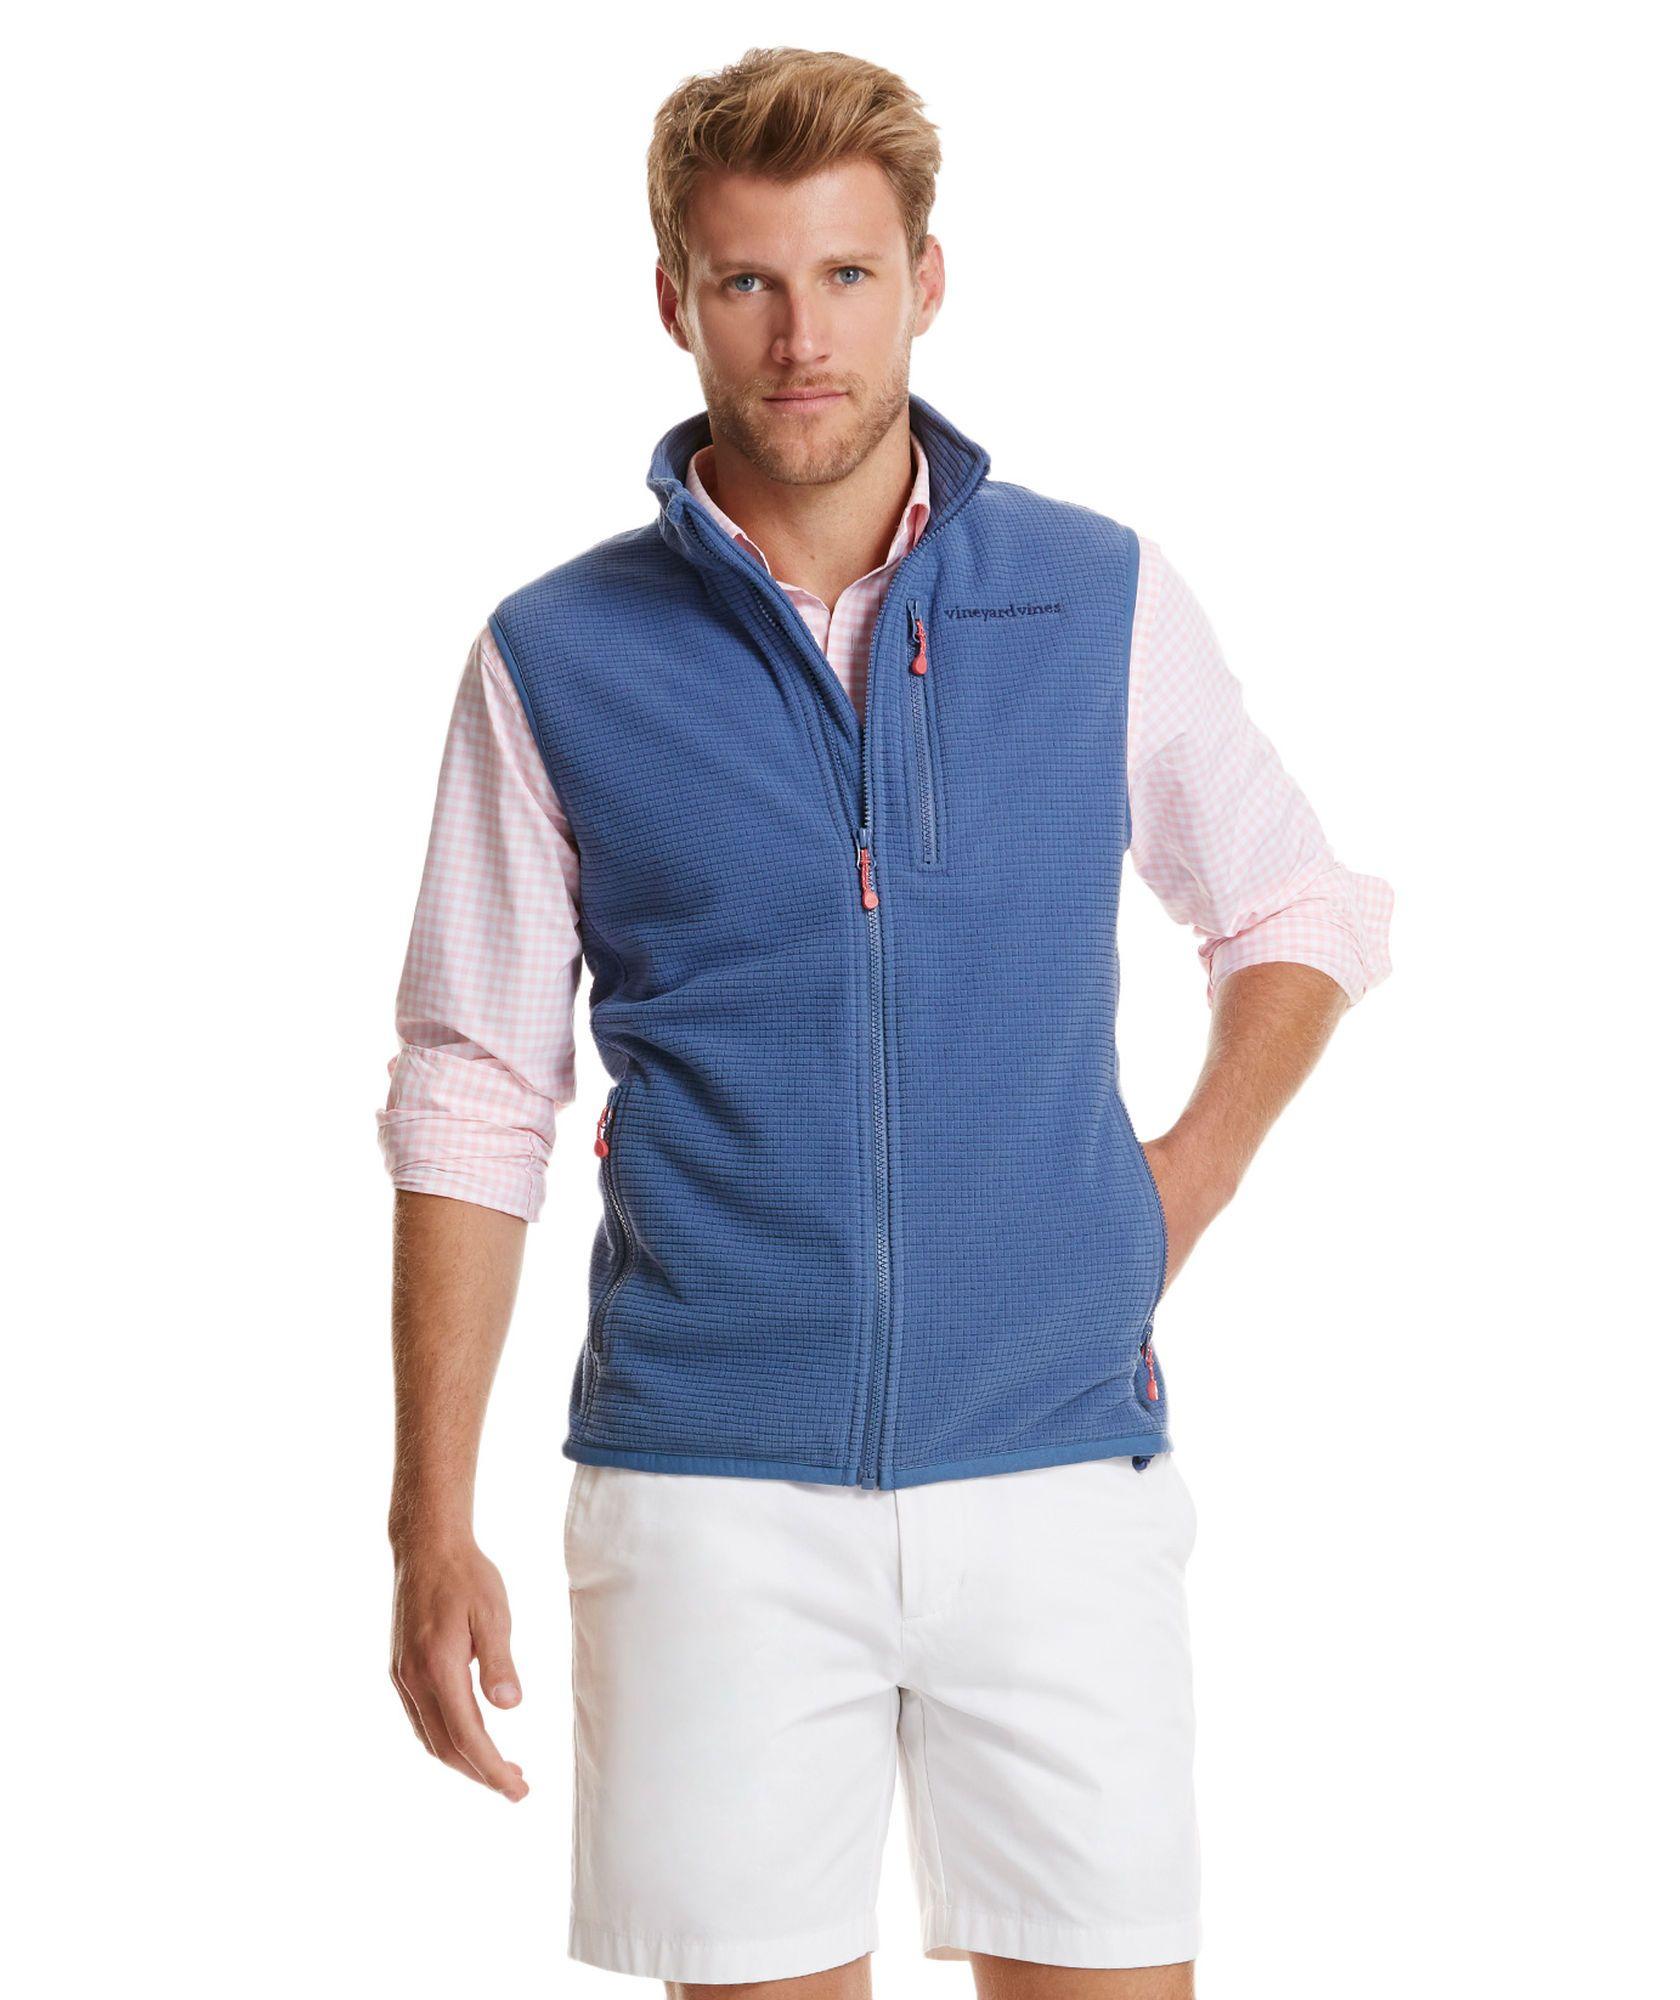 Grid fleece zip preppy pinterest shirts and womenus